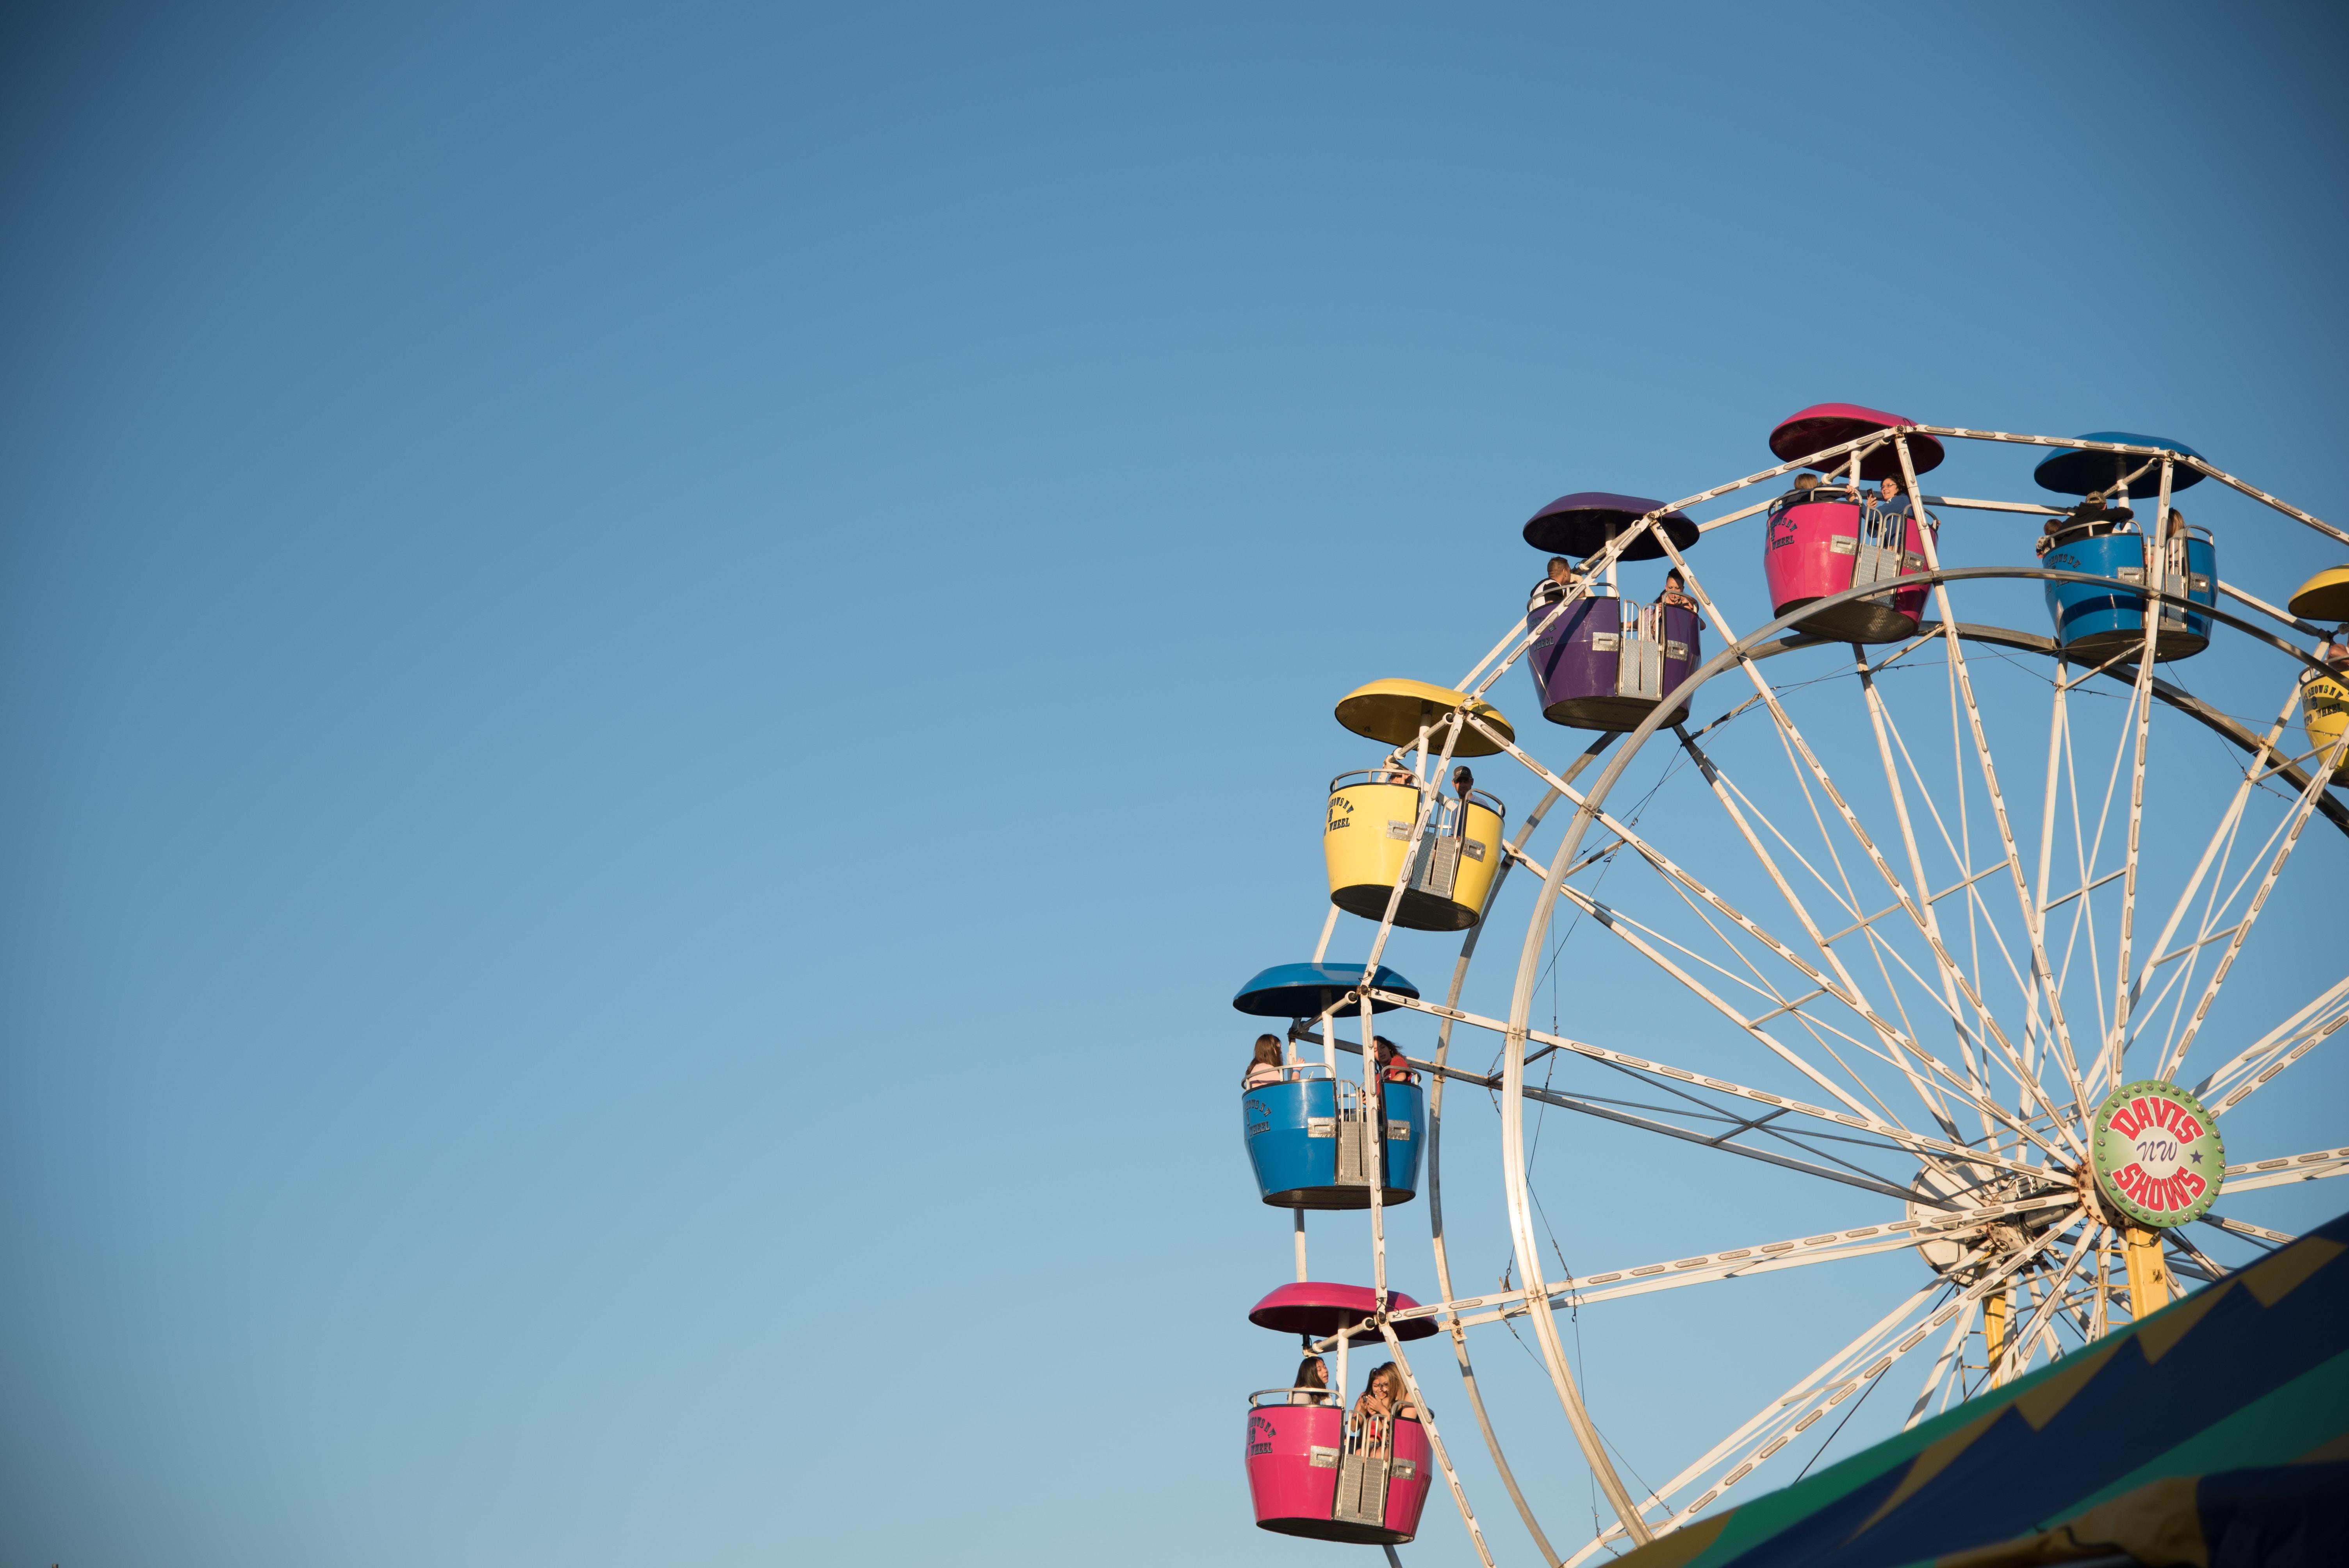 yellow and multicolored Ferris wheel ride